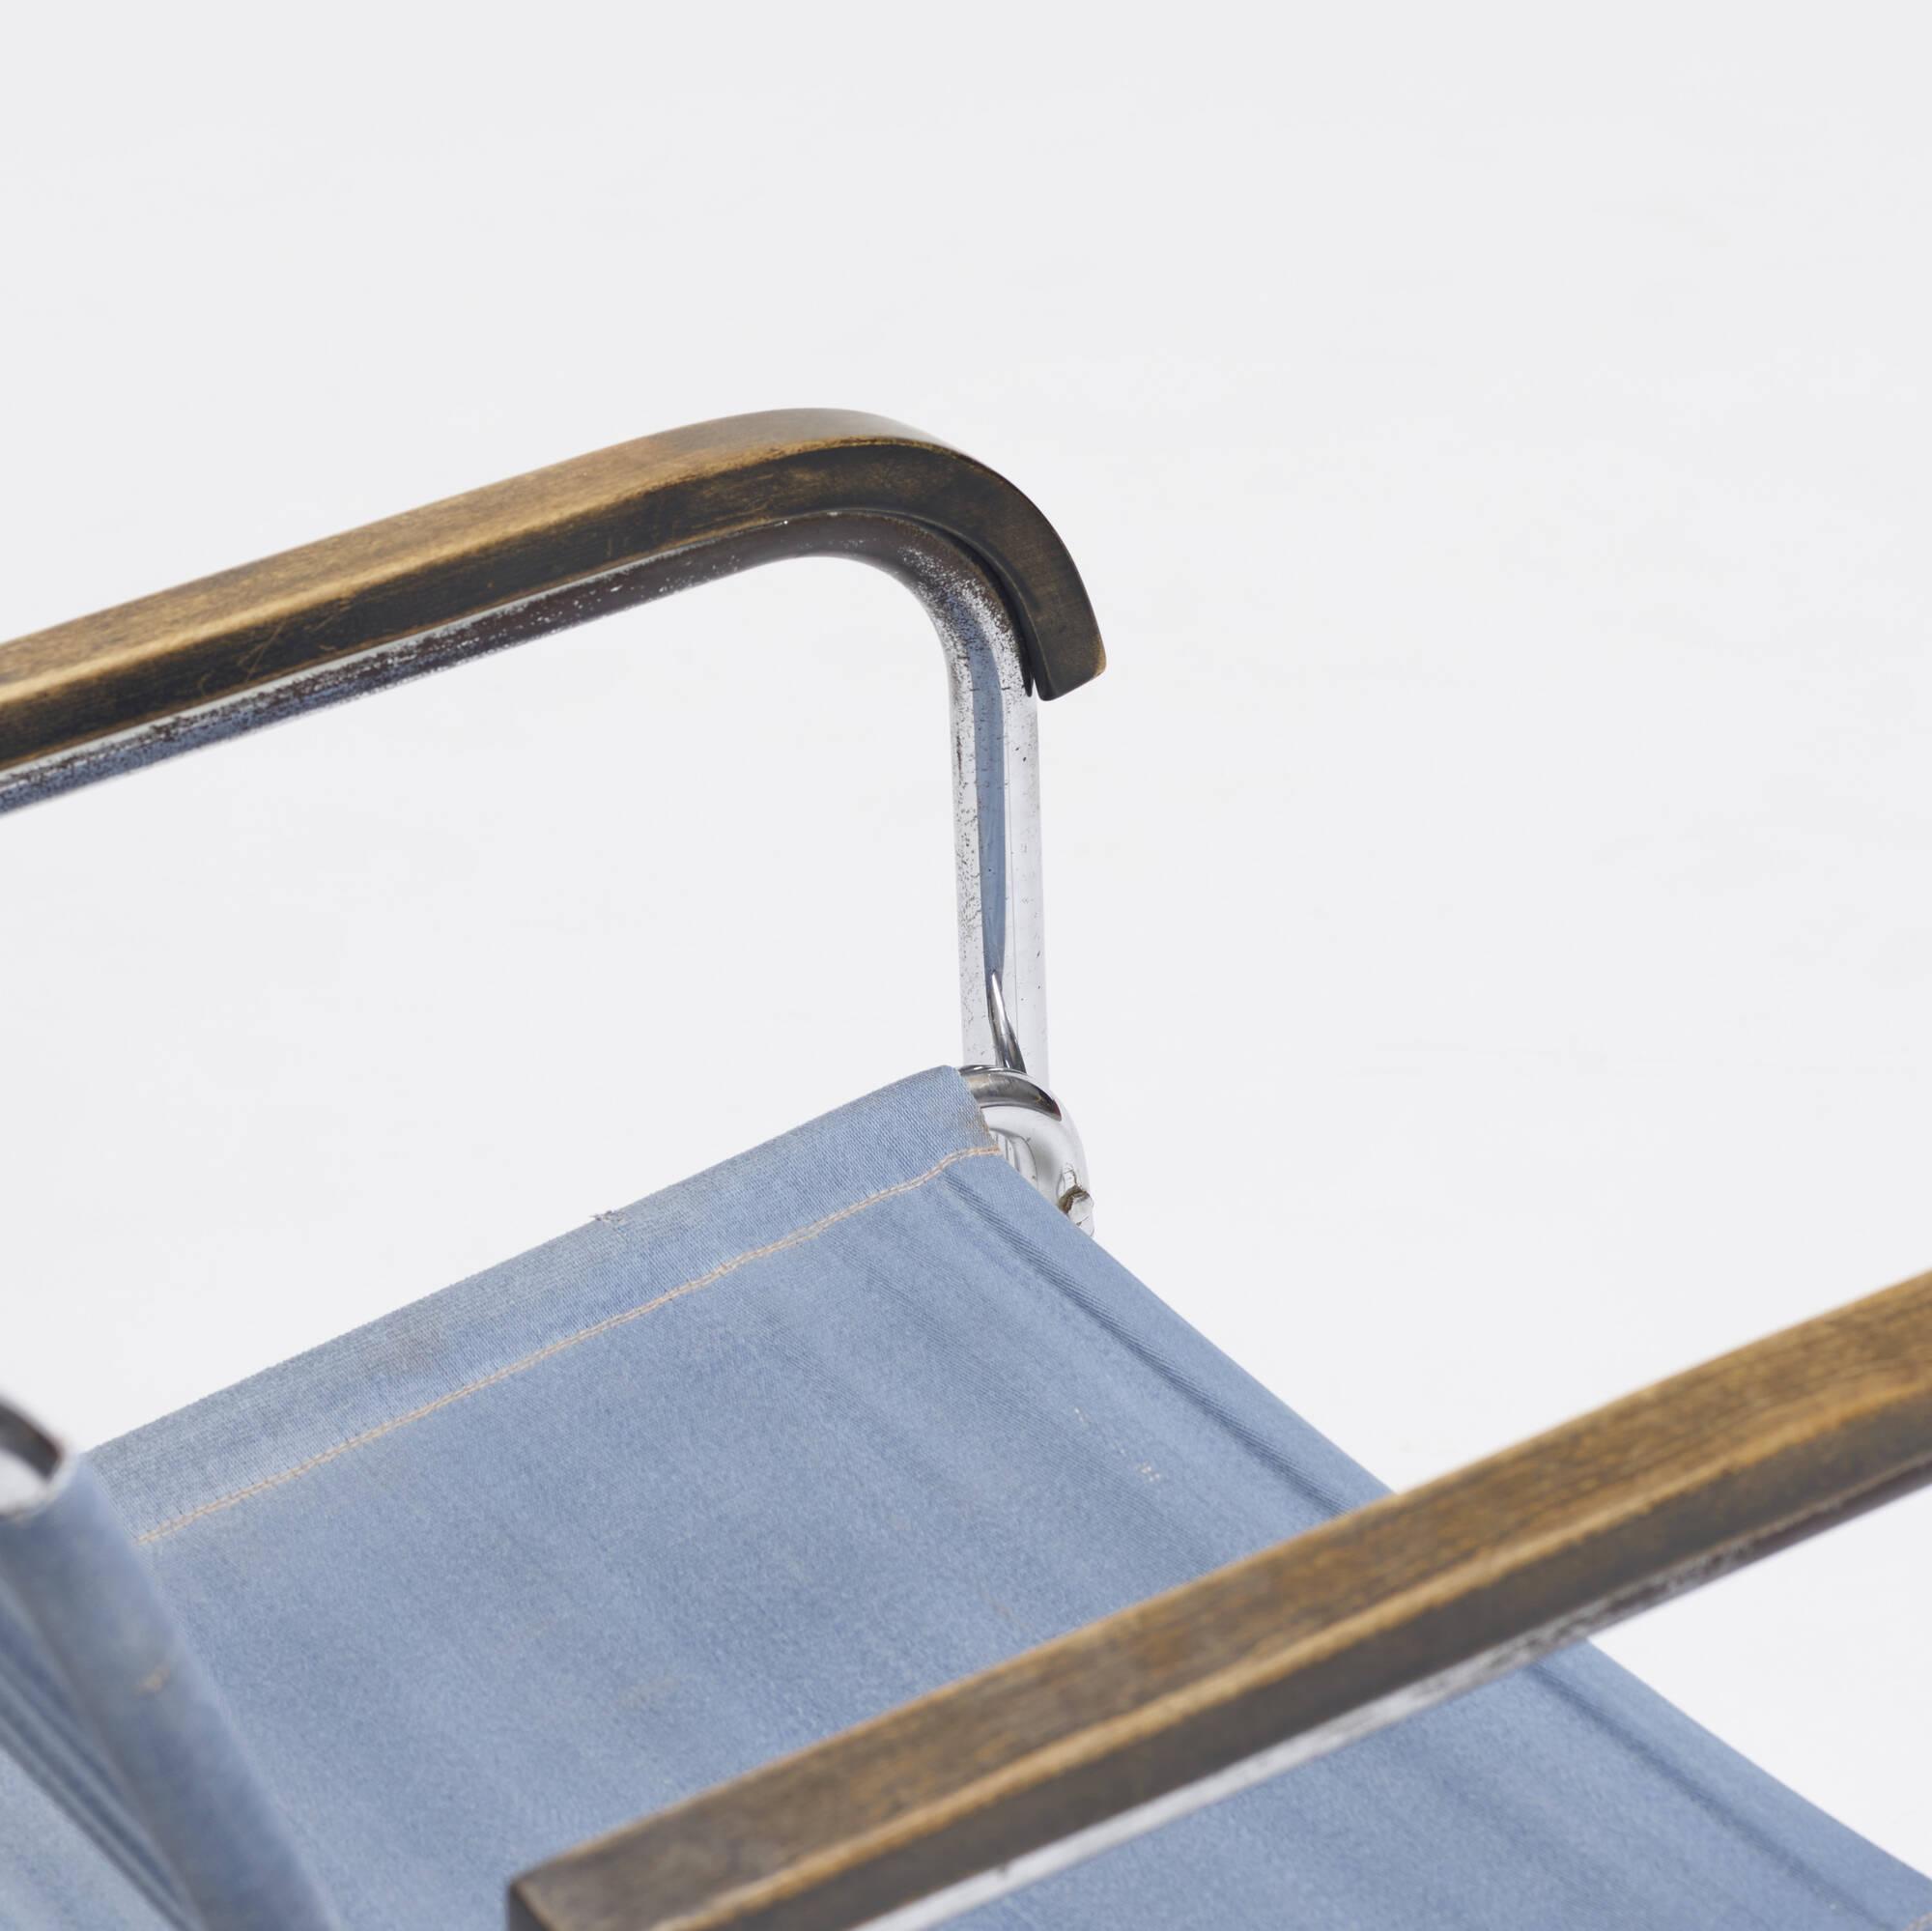 149: Marcel Breuer / armchair, model B32 (4 of 4)